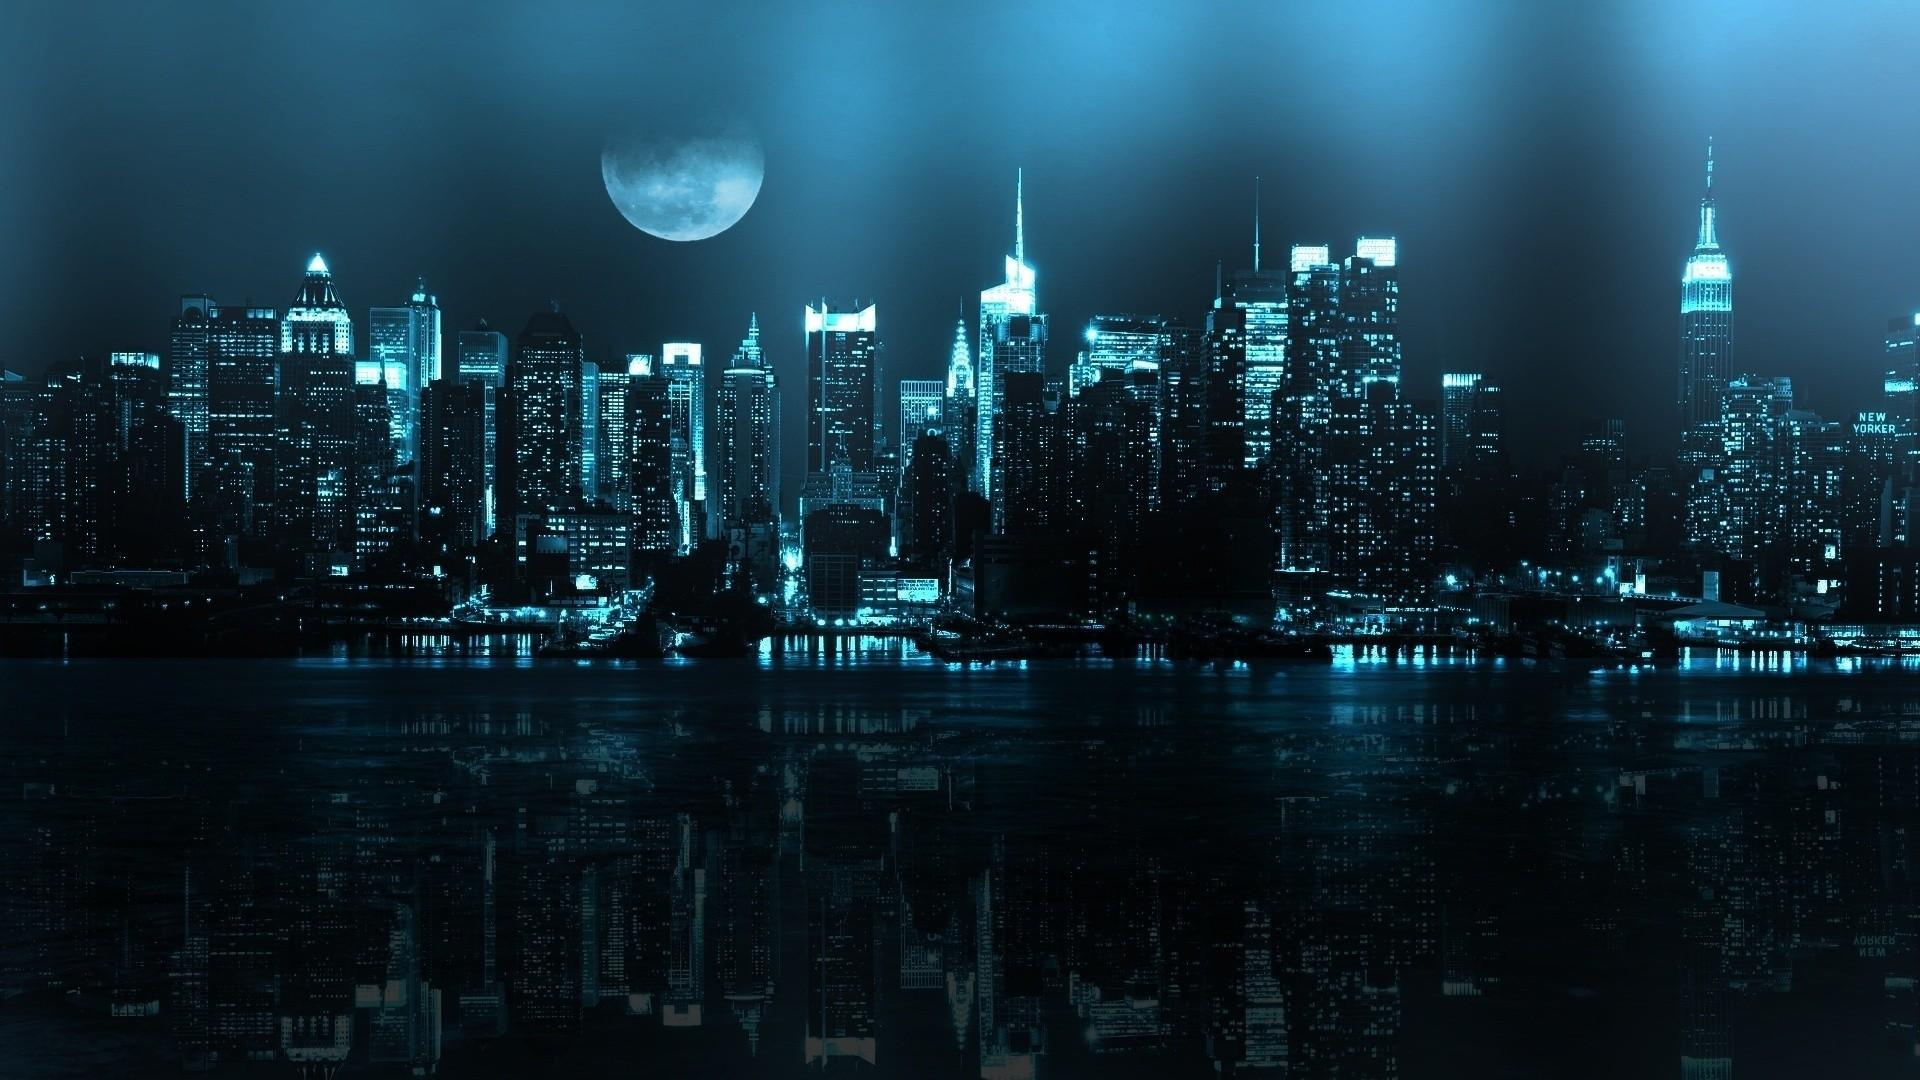 Dark City Wallpaper 1920x1080